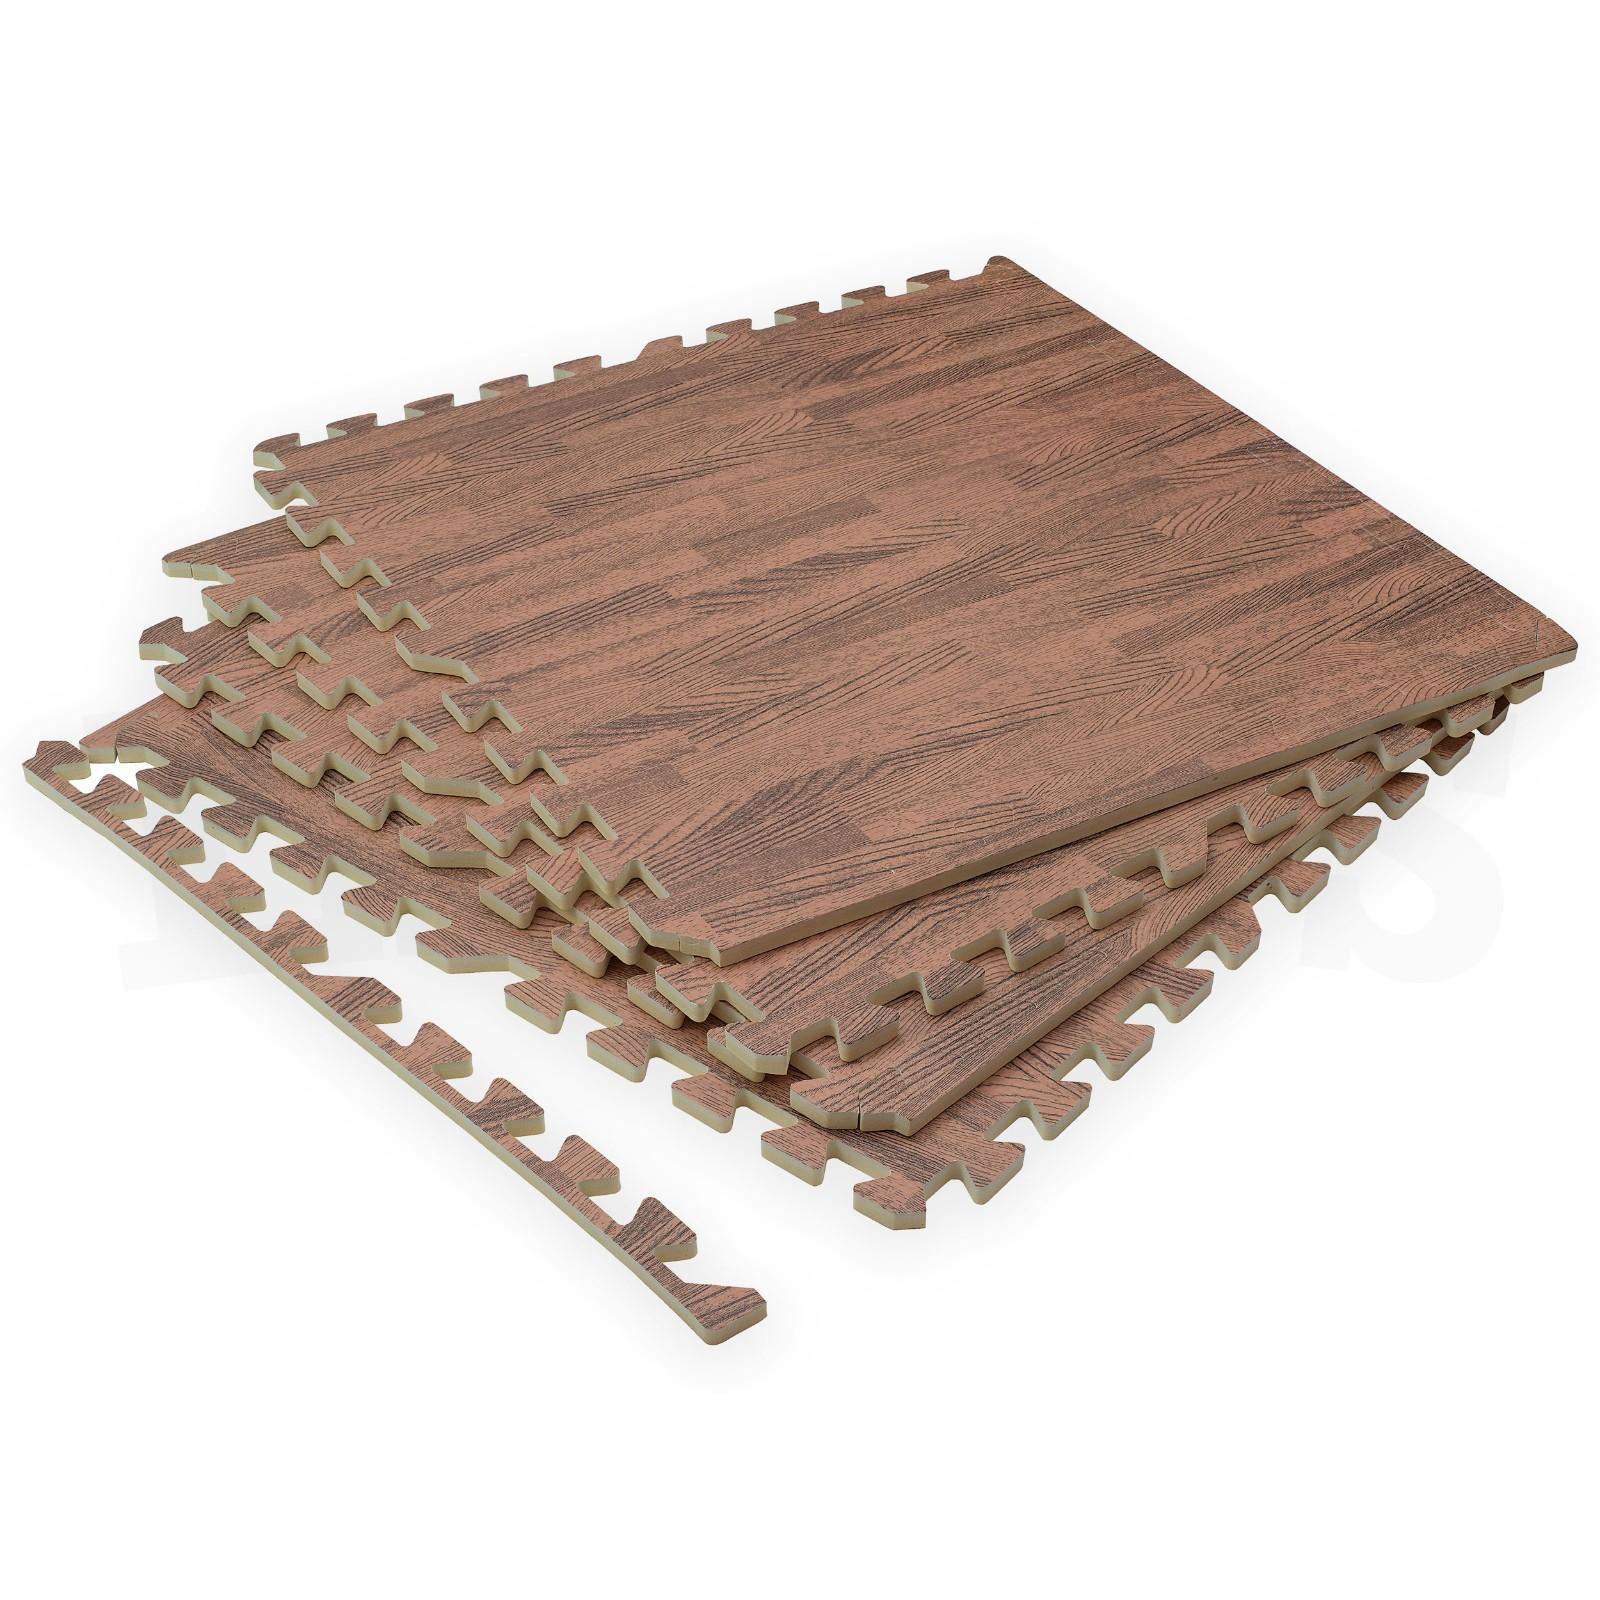 12 mm ad incastro eva mats Home Gym Pavimento Kids Roulotte Piastrelle 60x60cm